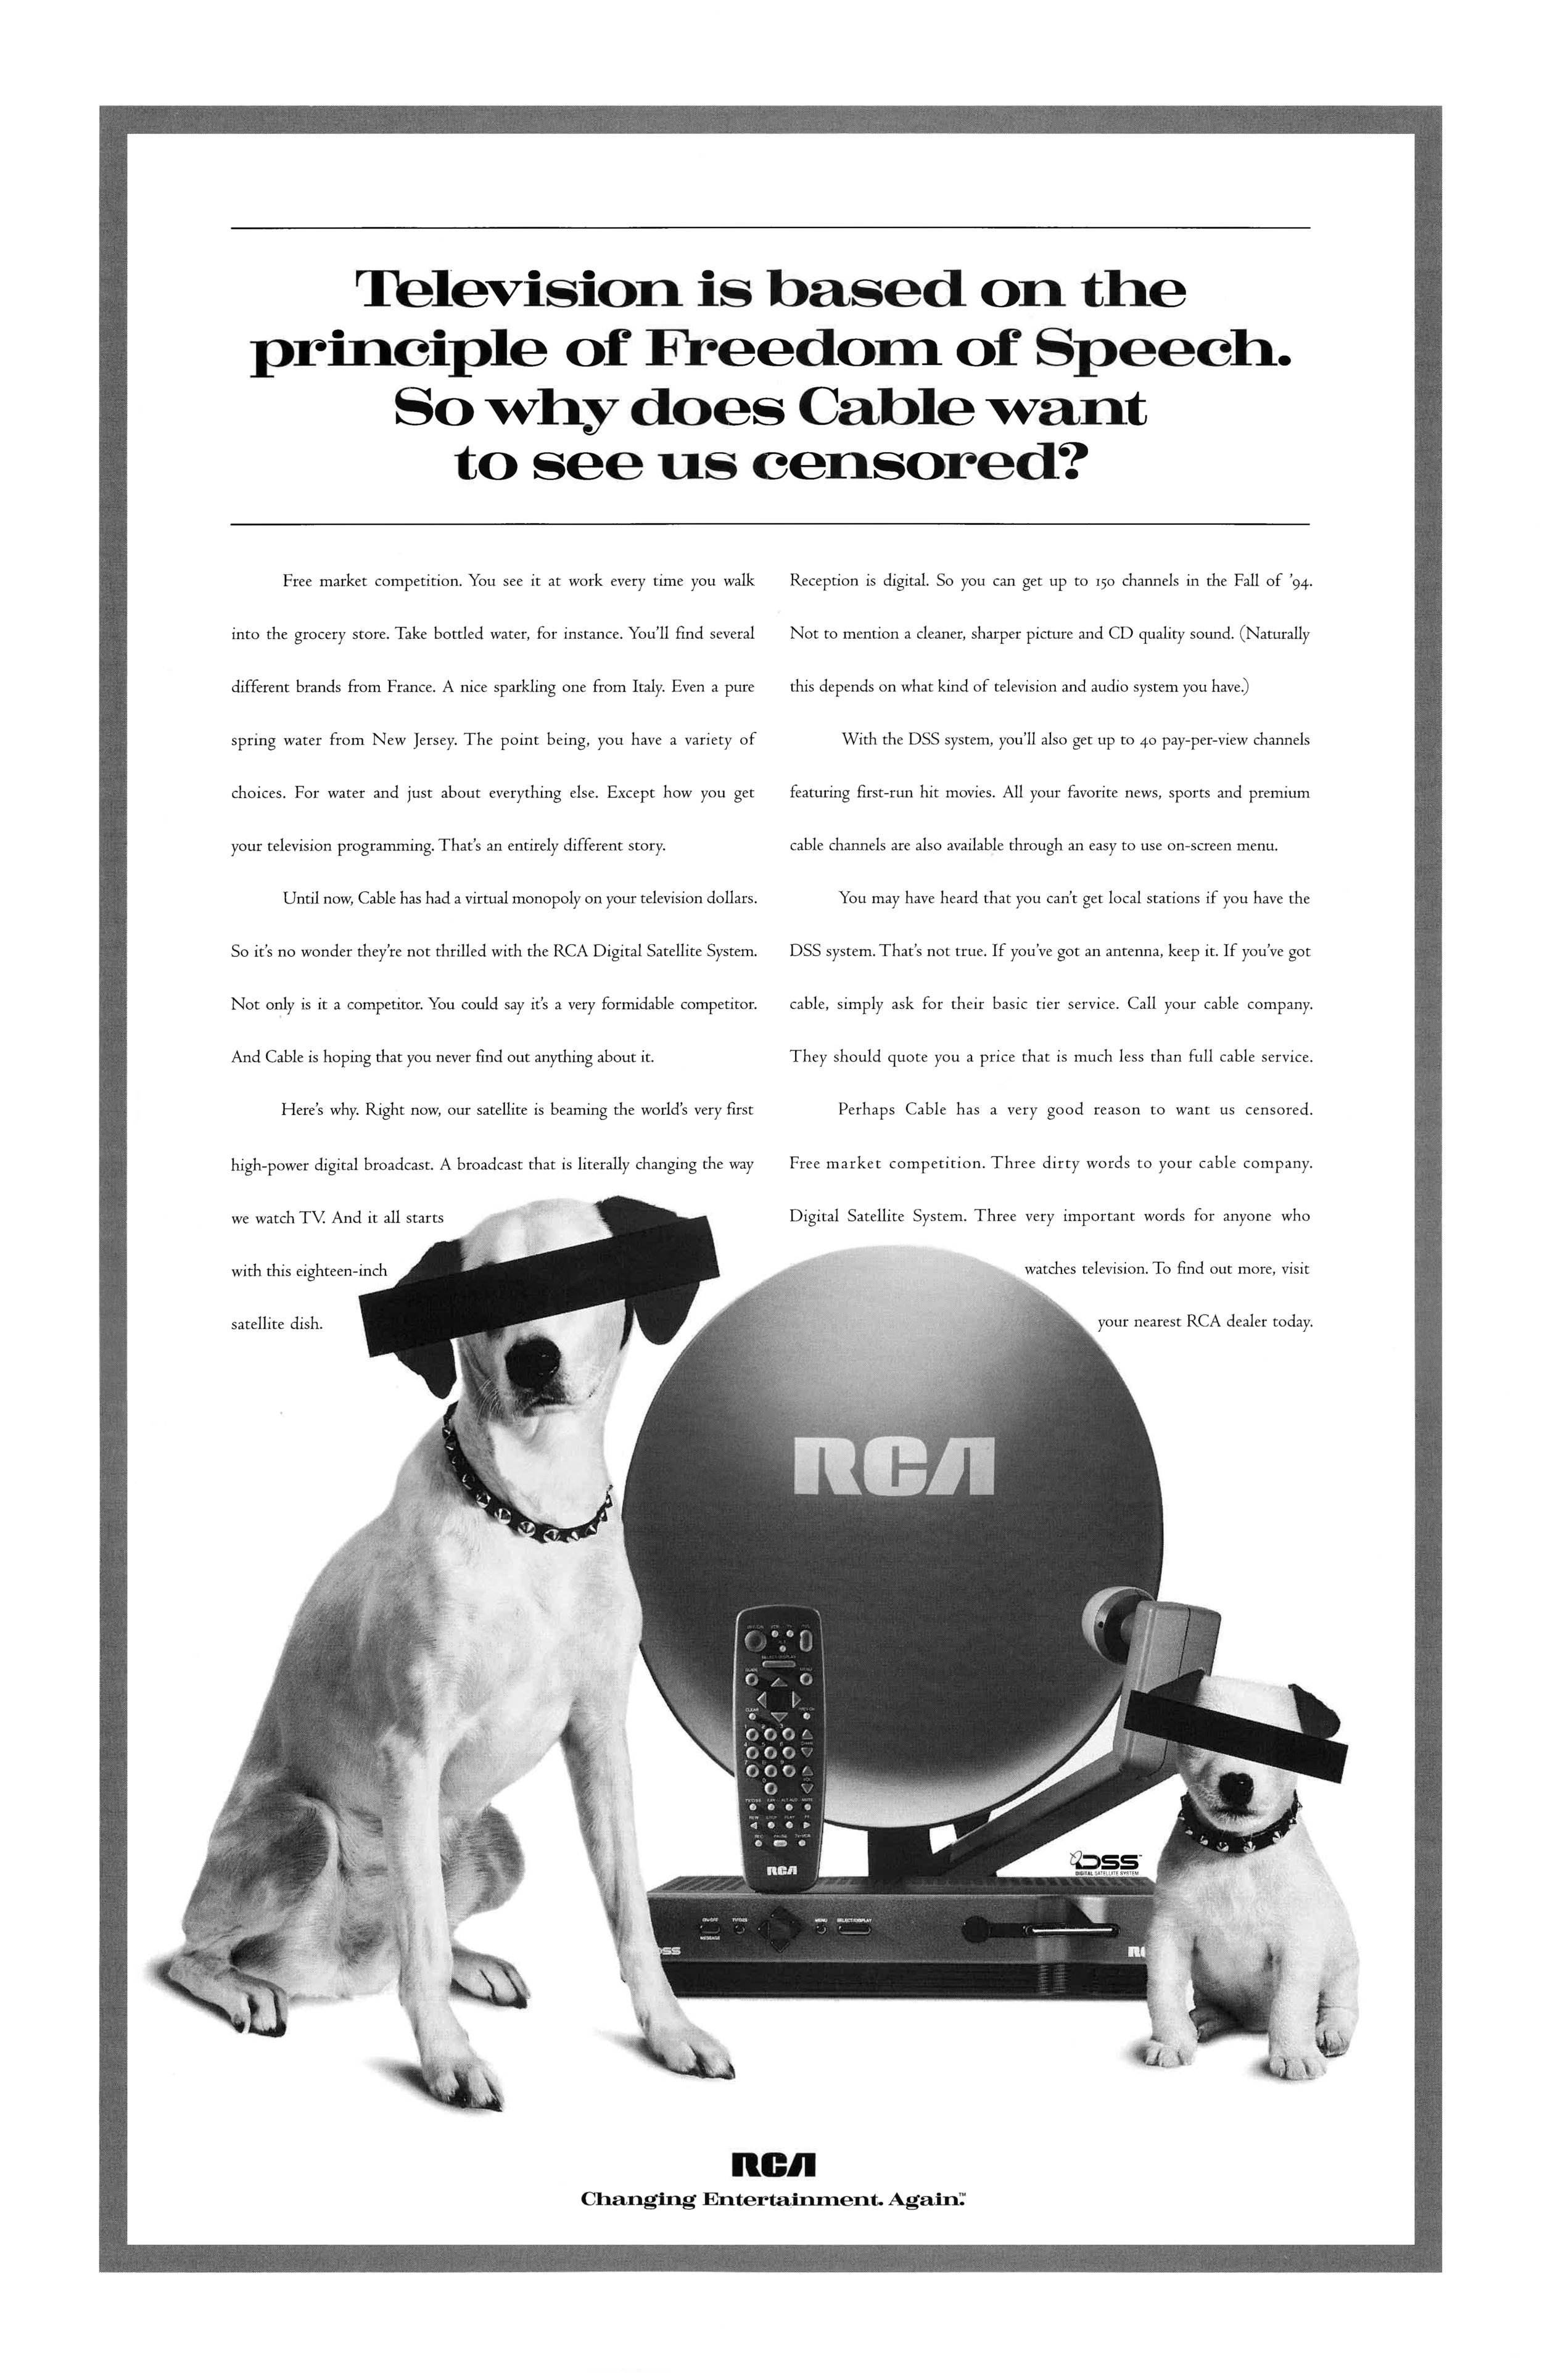 RCA Censored.jpg